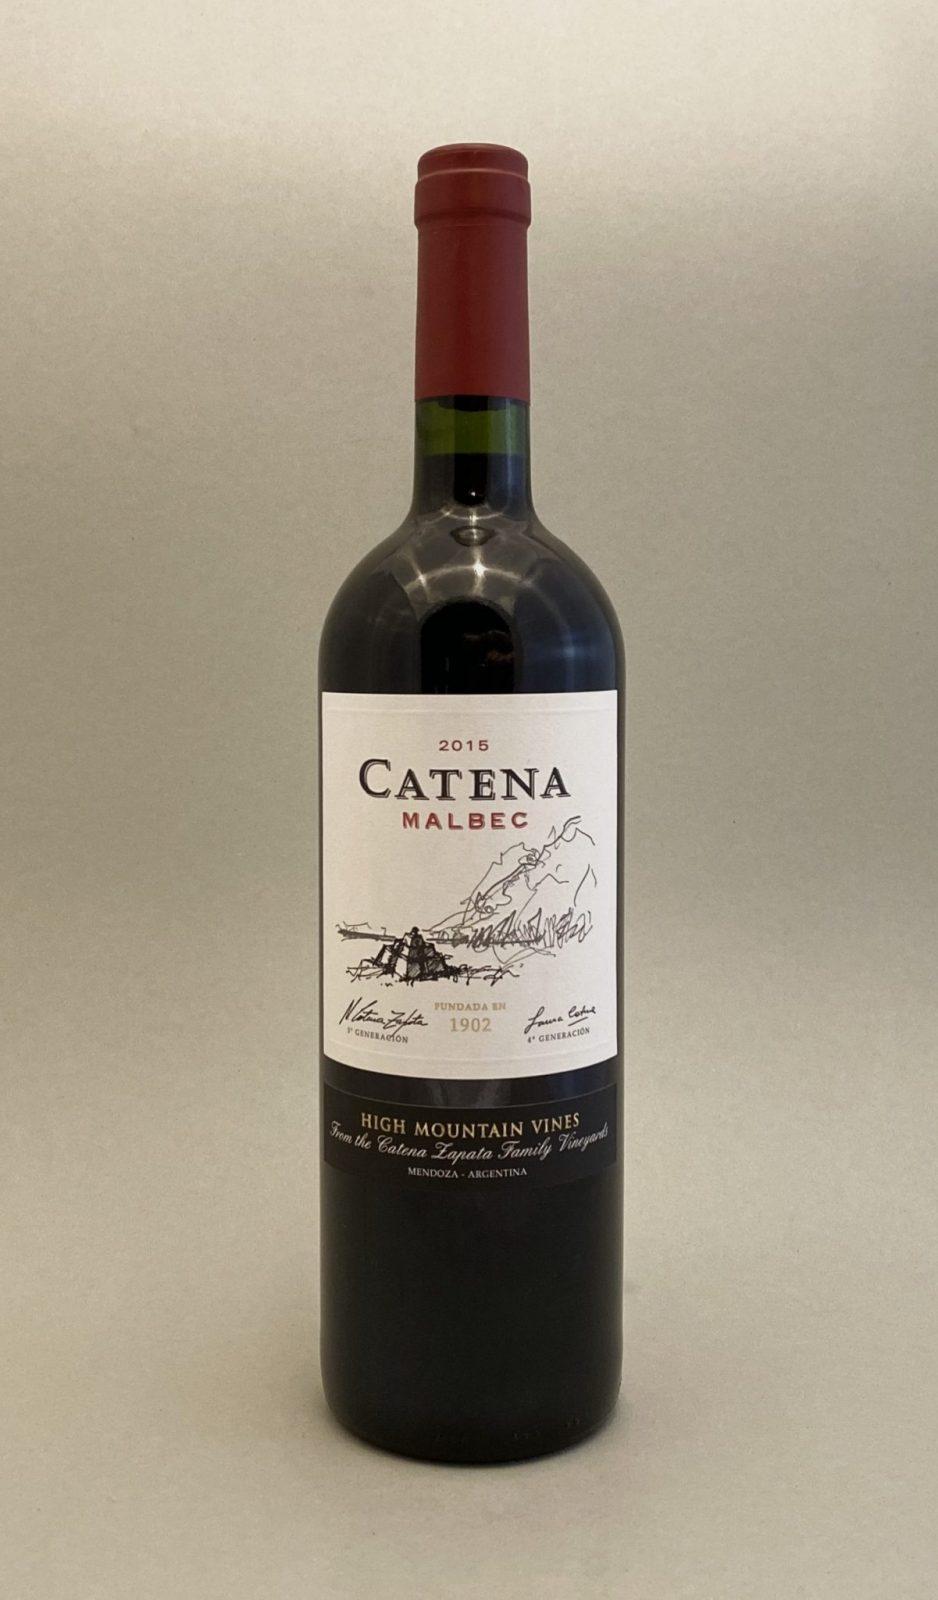 CATENA - Malbec 2015, vinoteka slnecnice Bratislava mesto, petrzalka, vino cervene z Argentiny